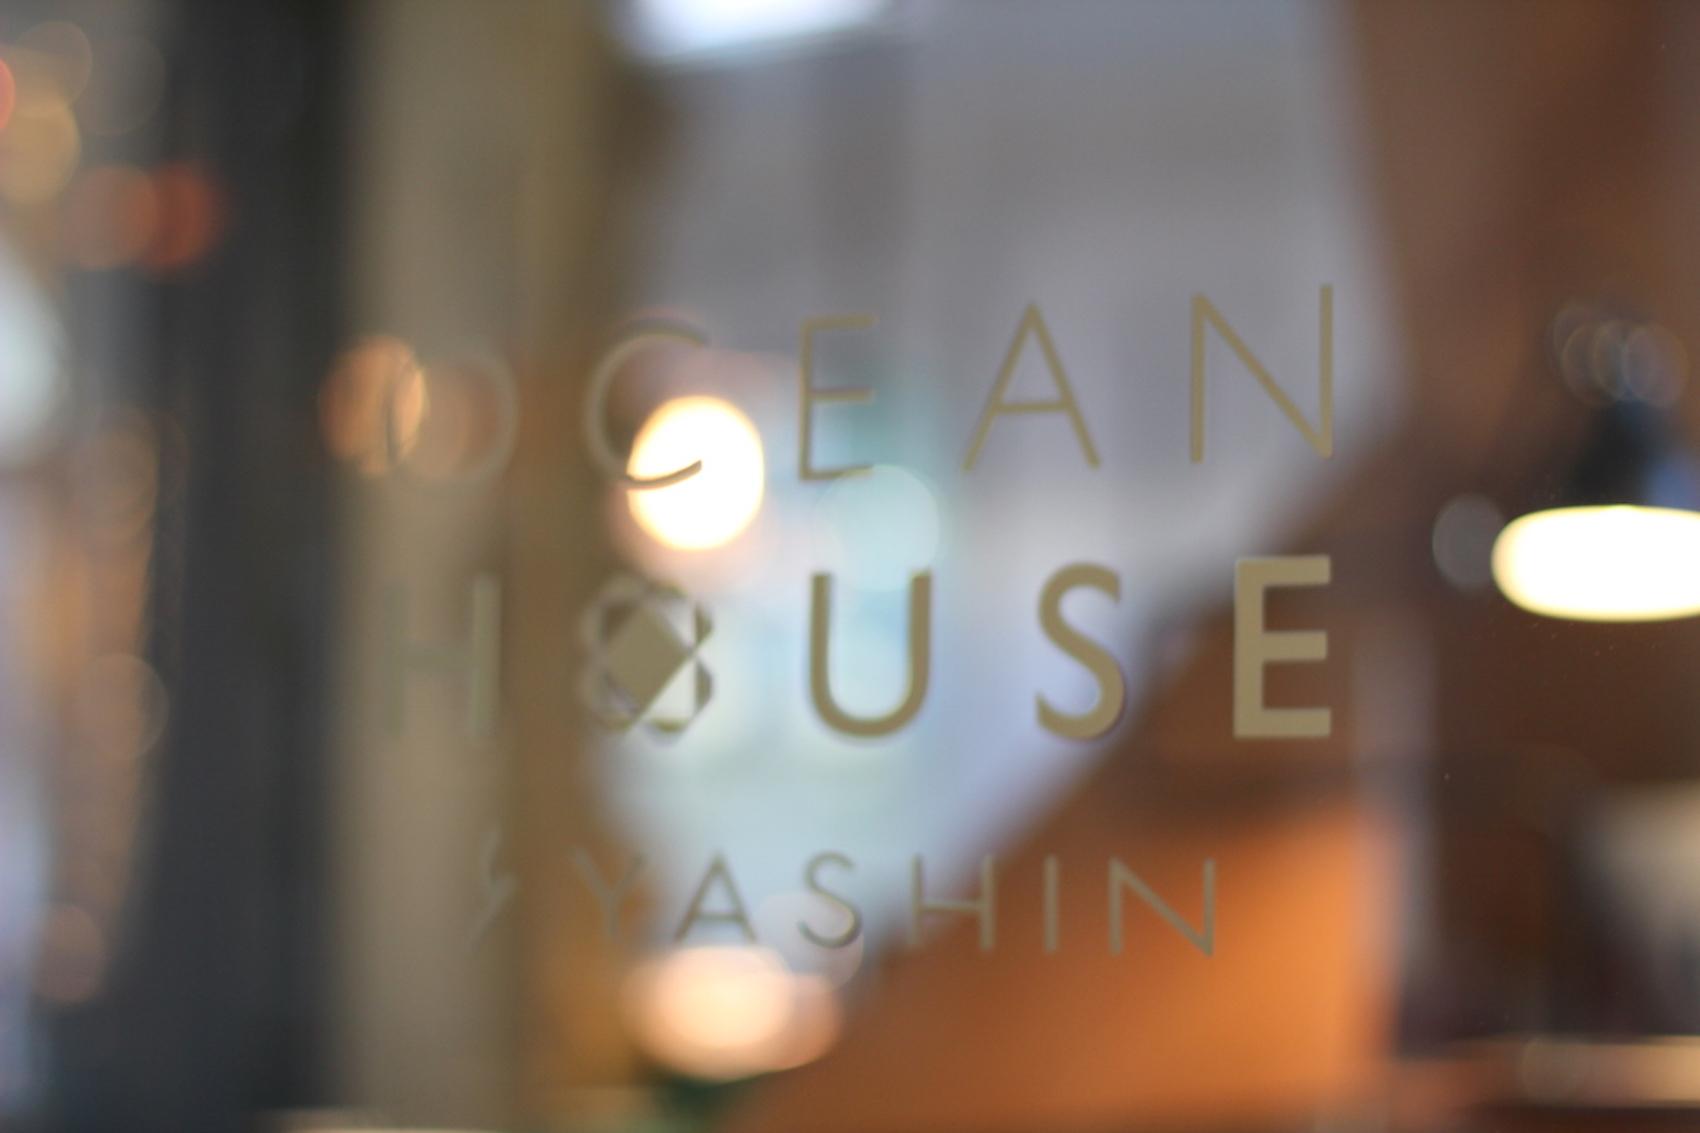 we-are-travel-girls-launch-event-yashin-ocean-london-35